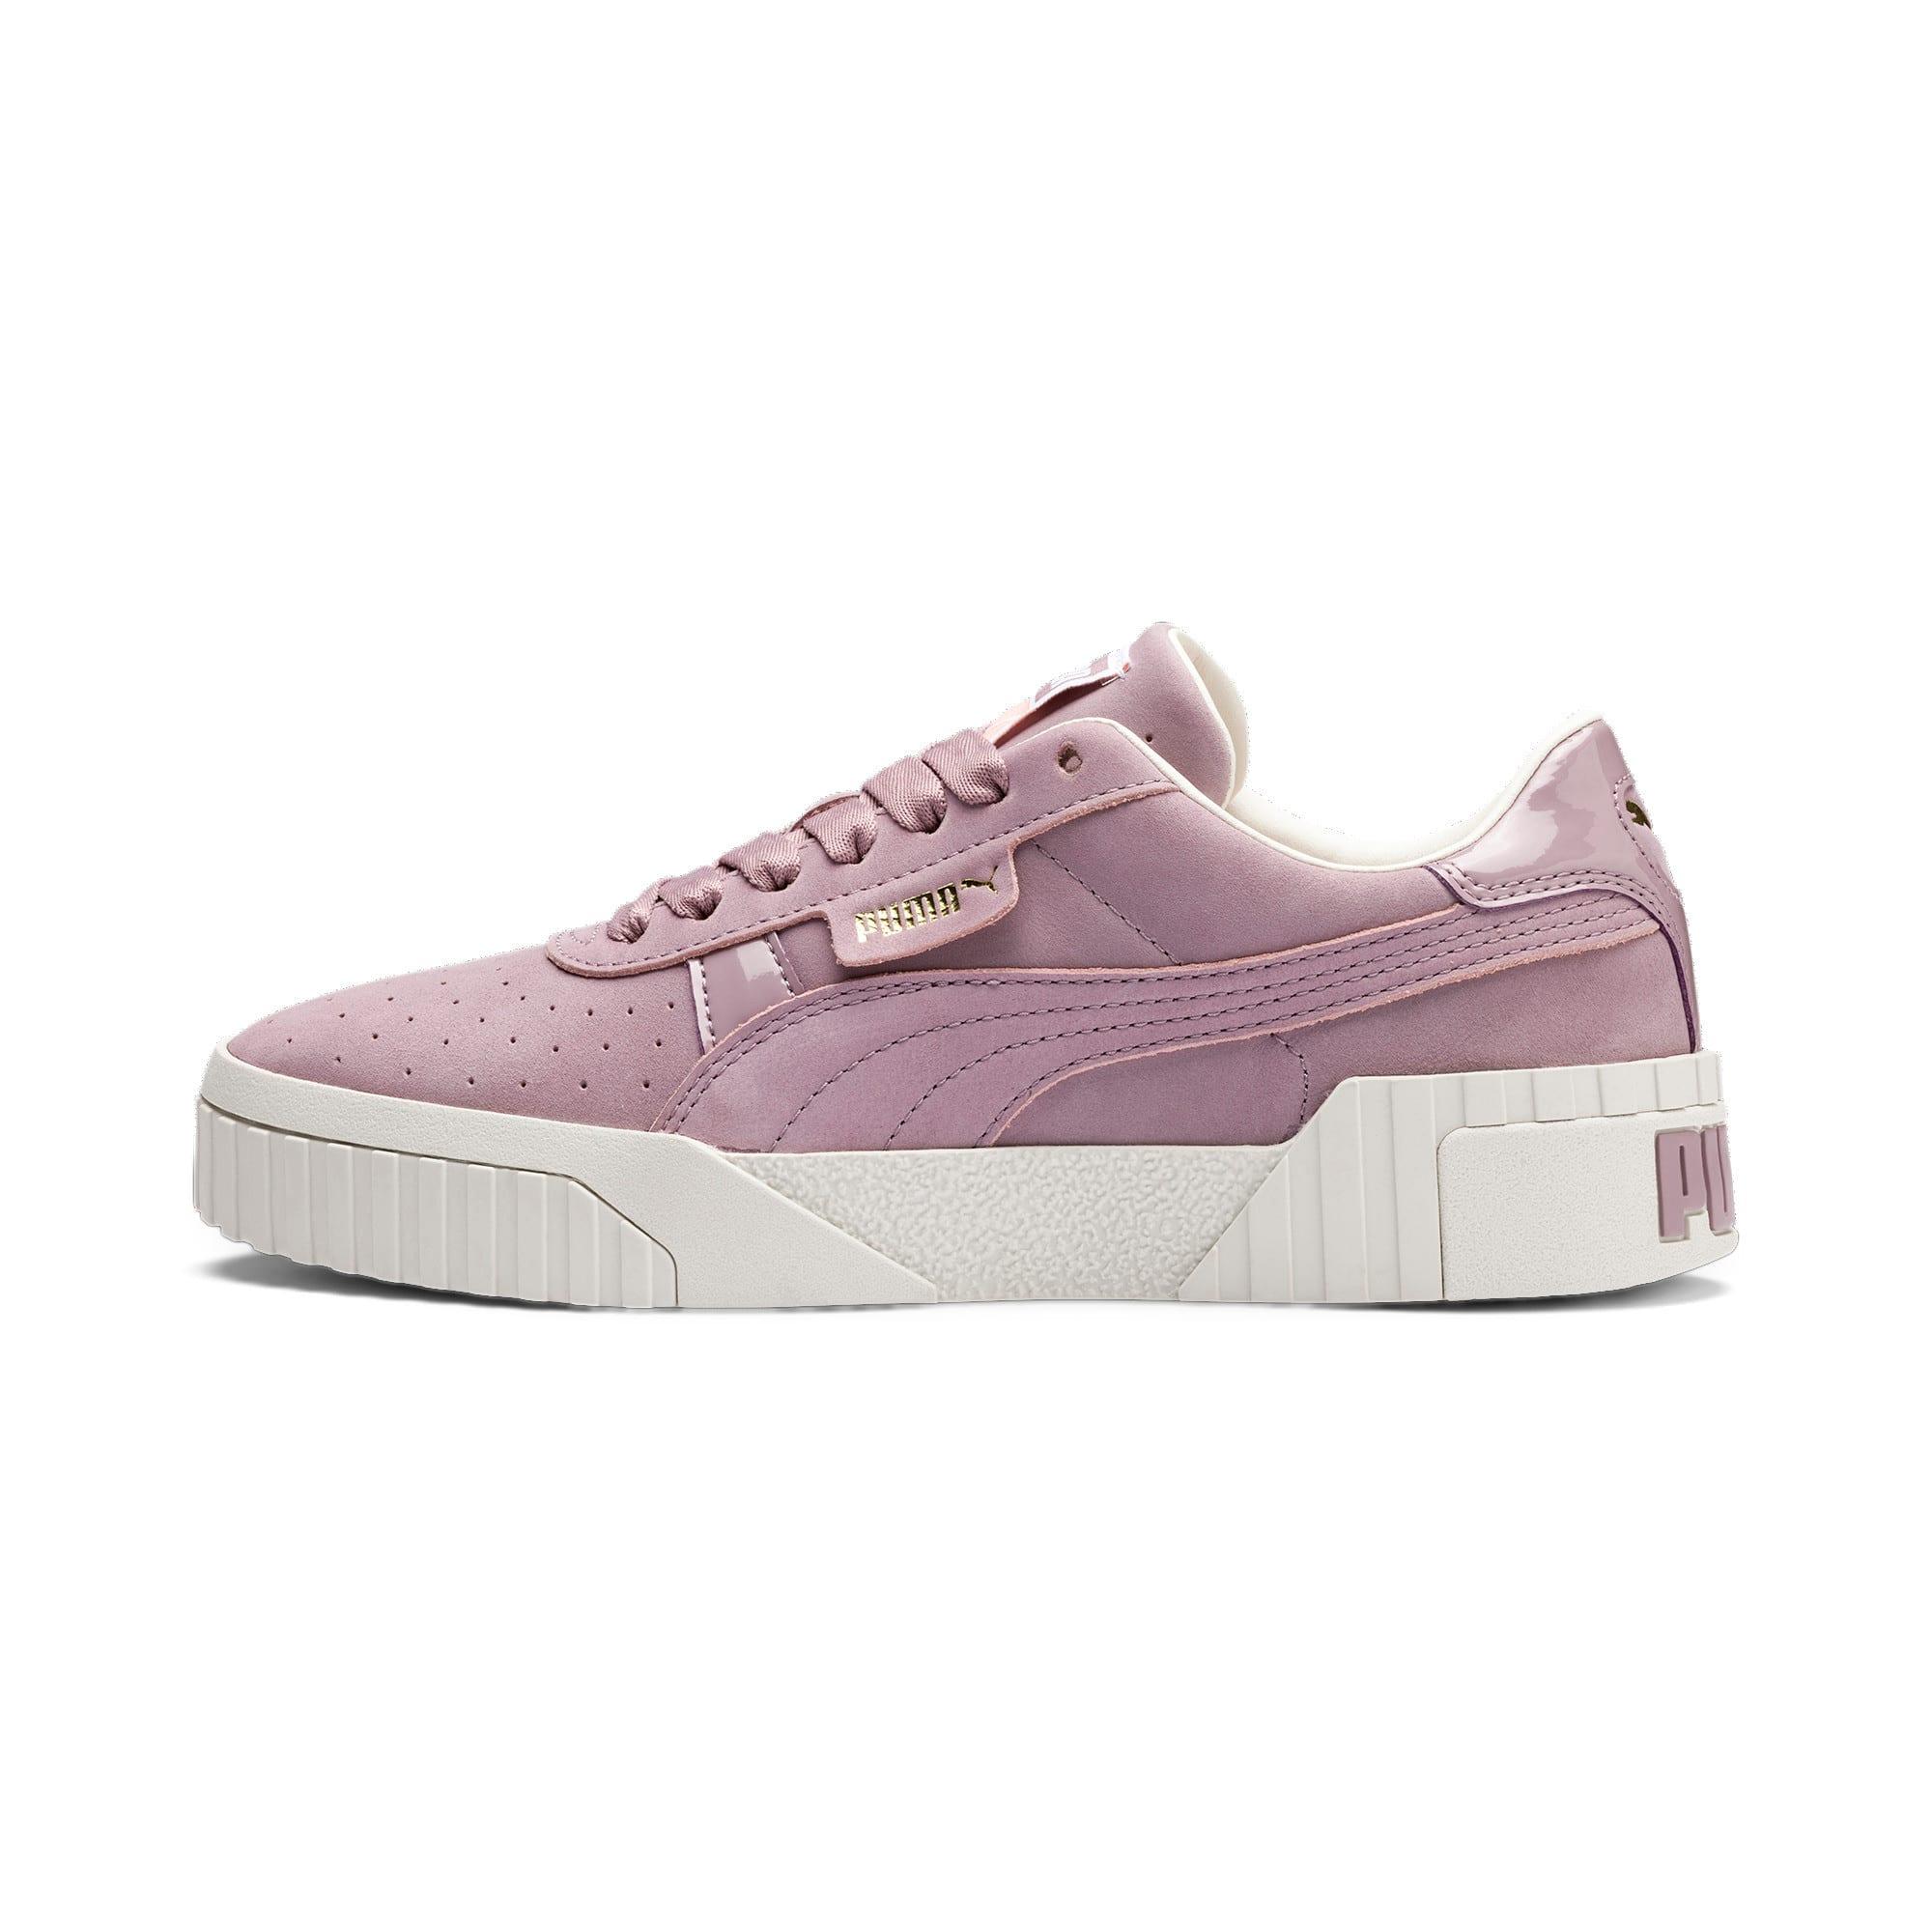 Thumbnail 1 of Cali Nubuck Women's Sneakers, Elderberry, medium